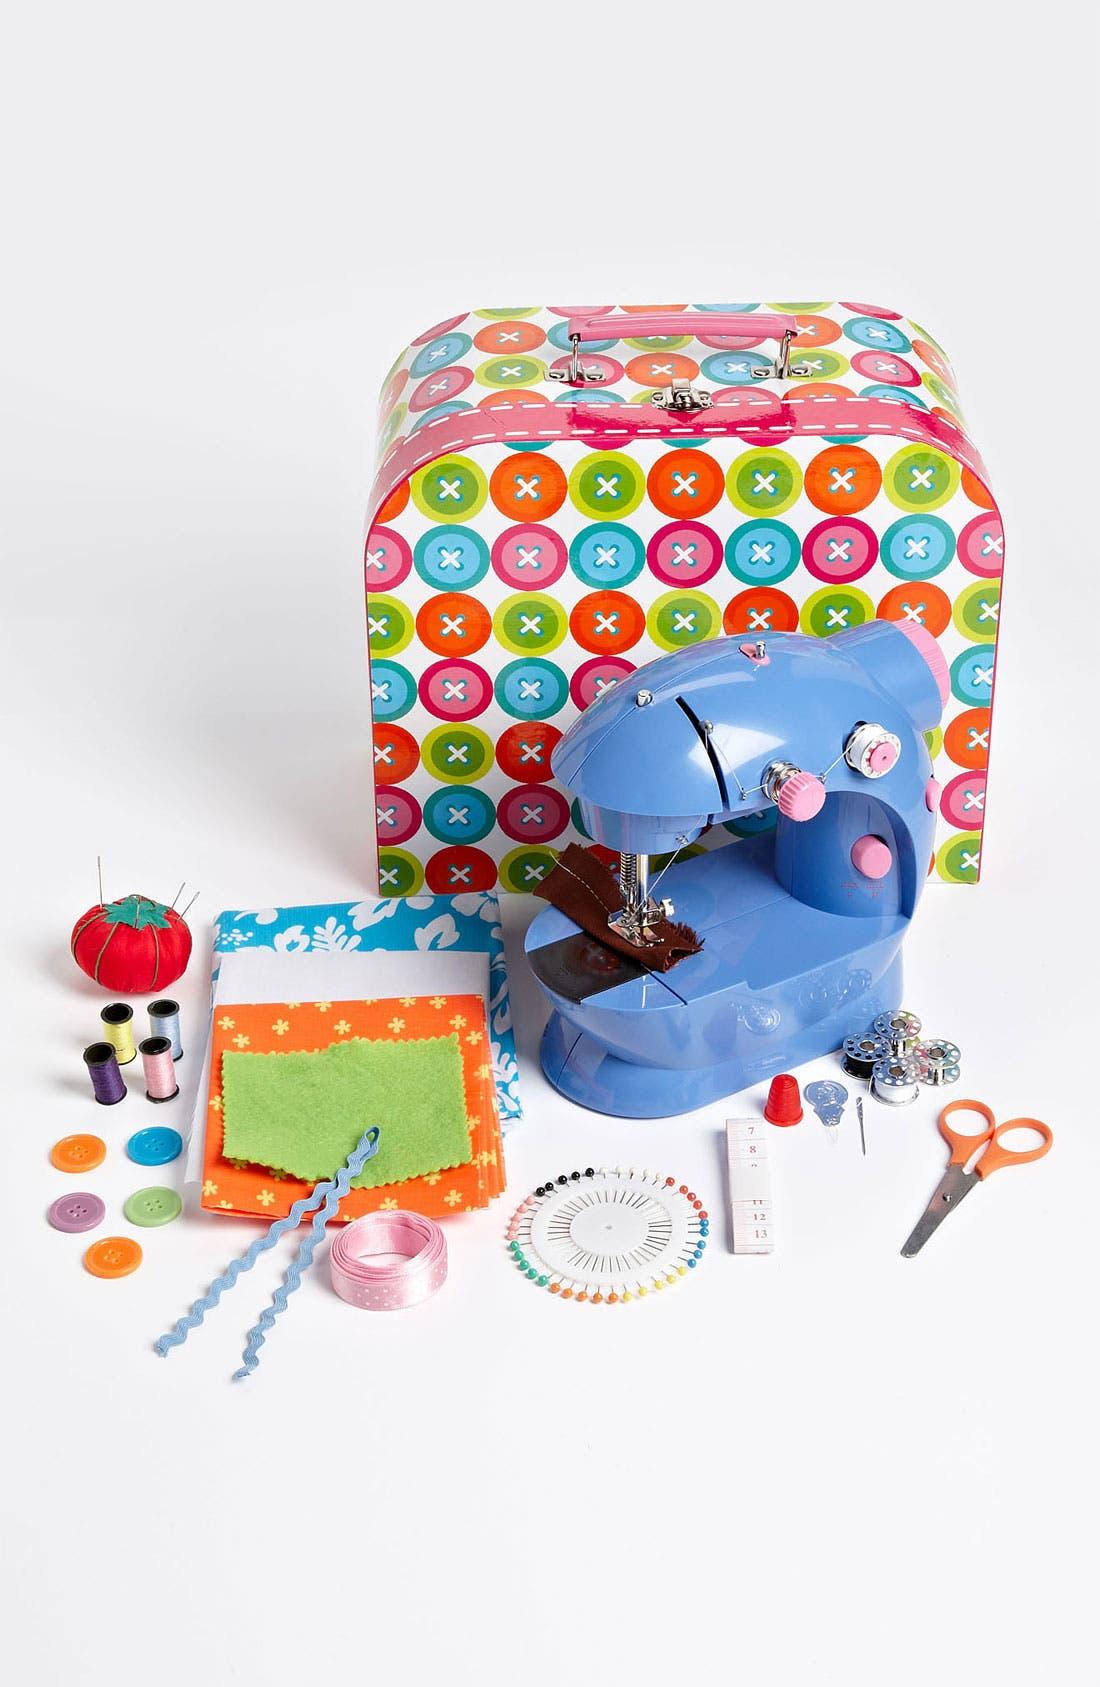 Alternate Image 1 Selected - Alex® Toys 'Sew Fun' Sewing Machine & Kit